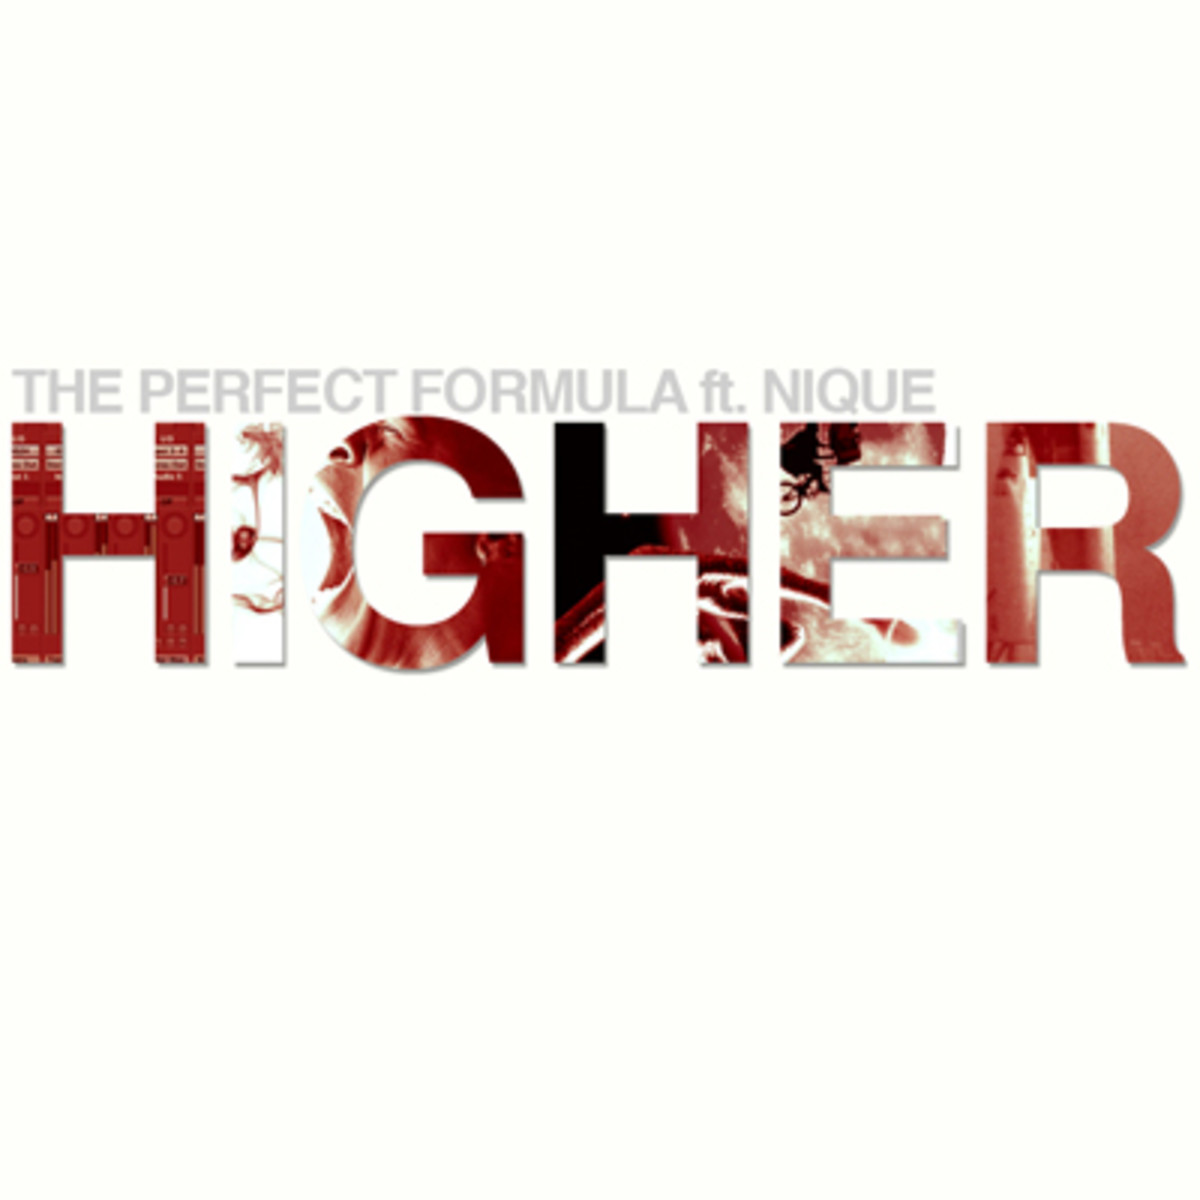 perfectformula-higher.jpg